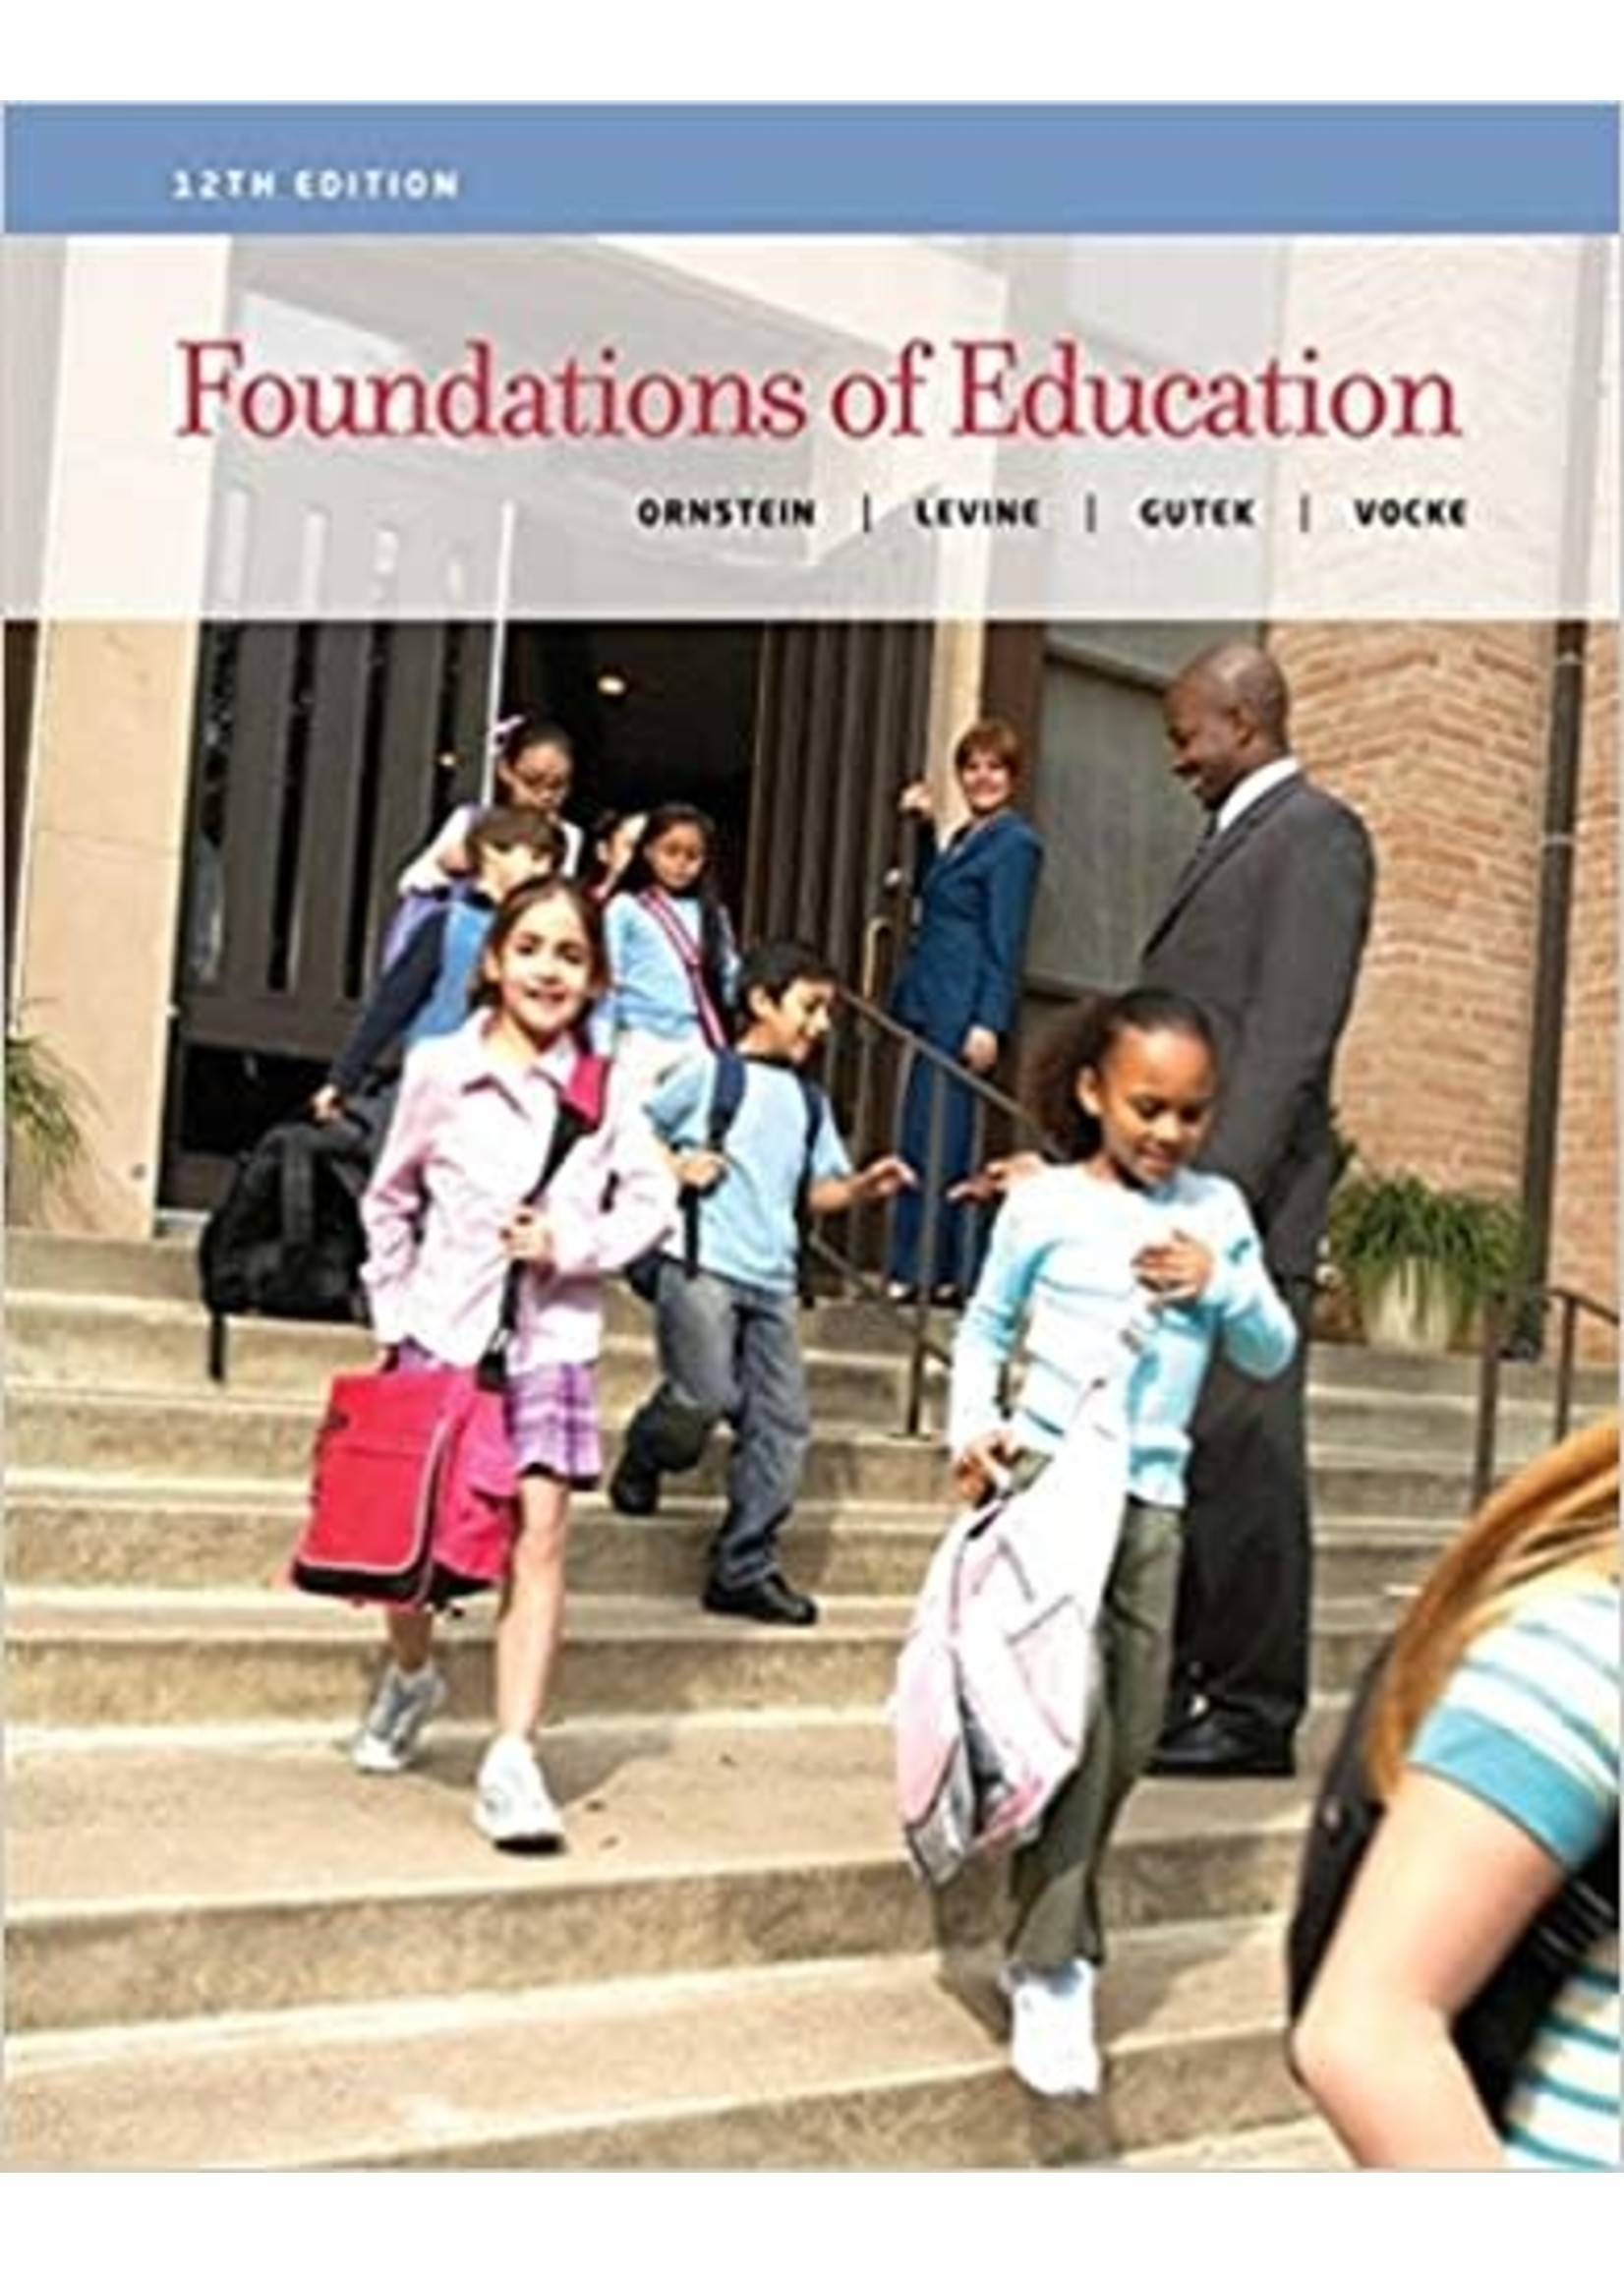 EDF375 FOUNDATIONS OF EDUCATION